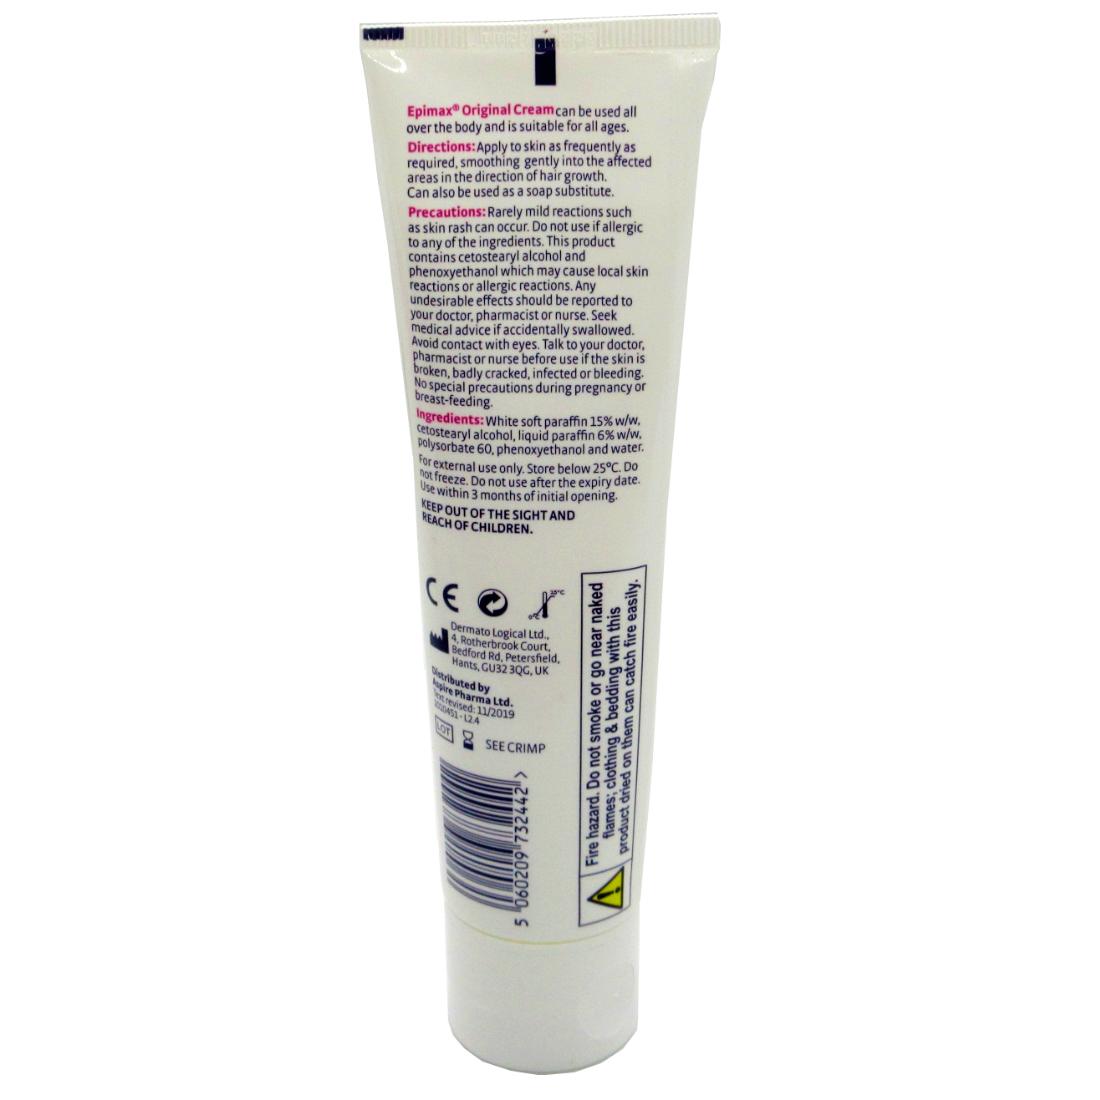 Epimax Cream for Eczema and Psoriasis SLS Free 4 100g Bottles